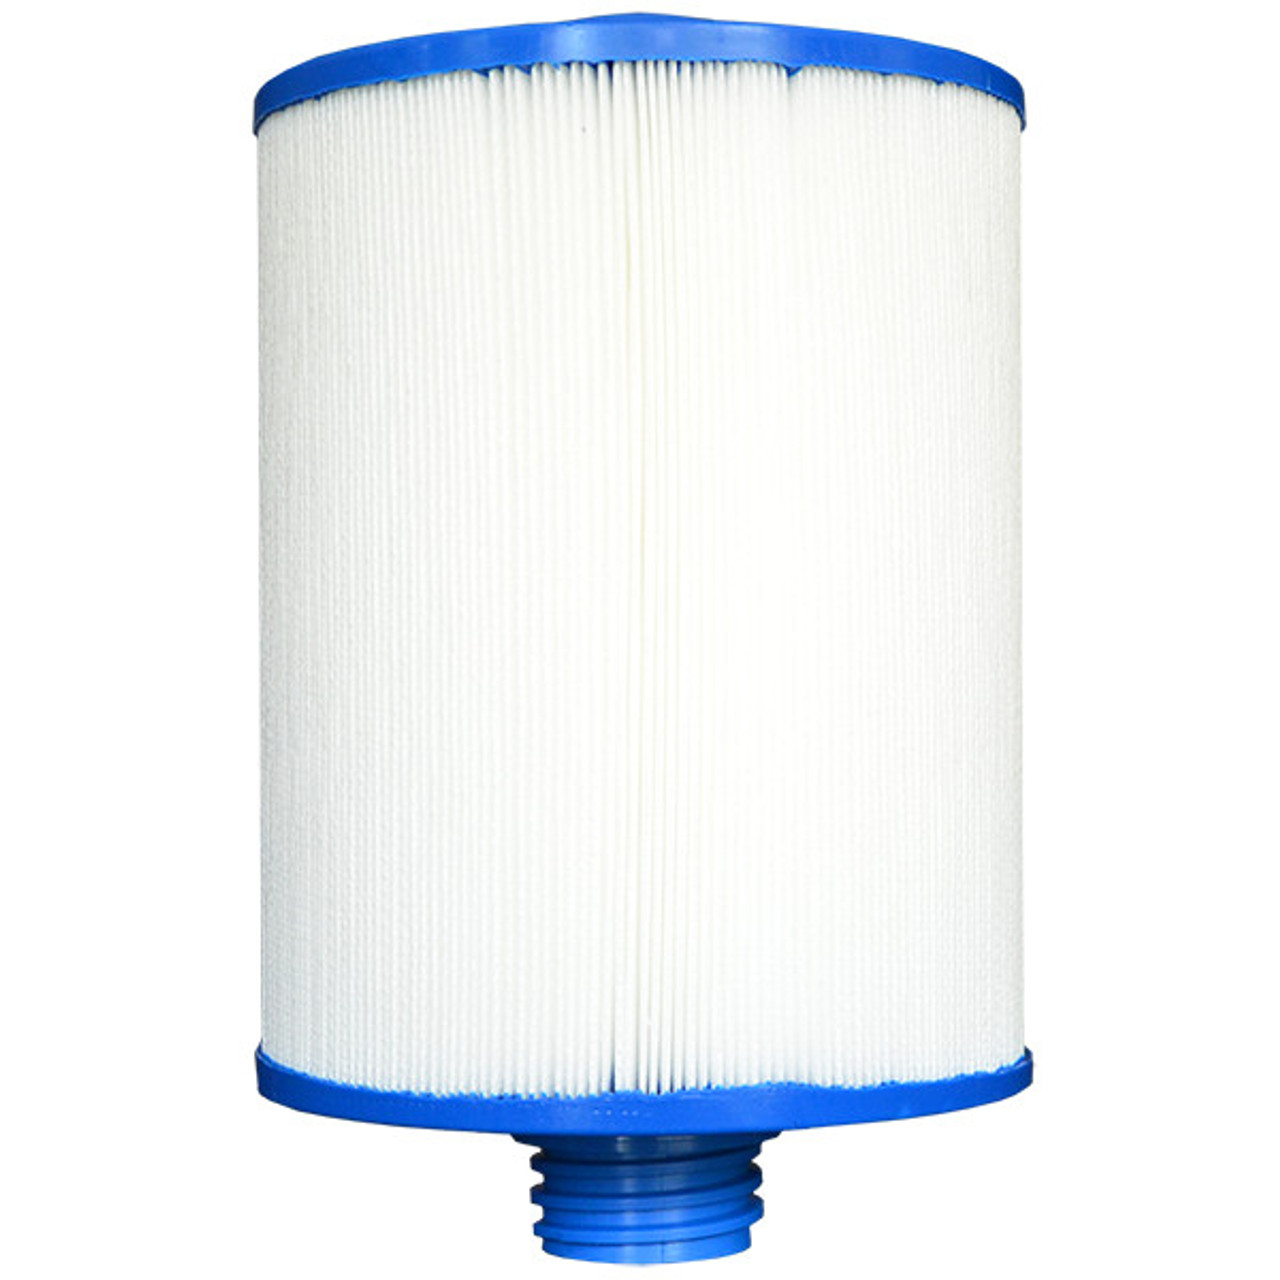 Pleatco Advanced Hot Tub Filter Pww50p3